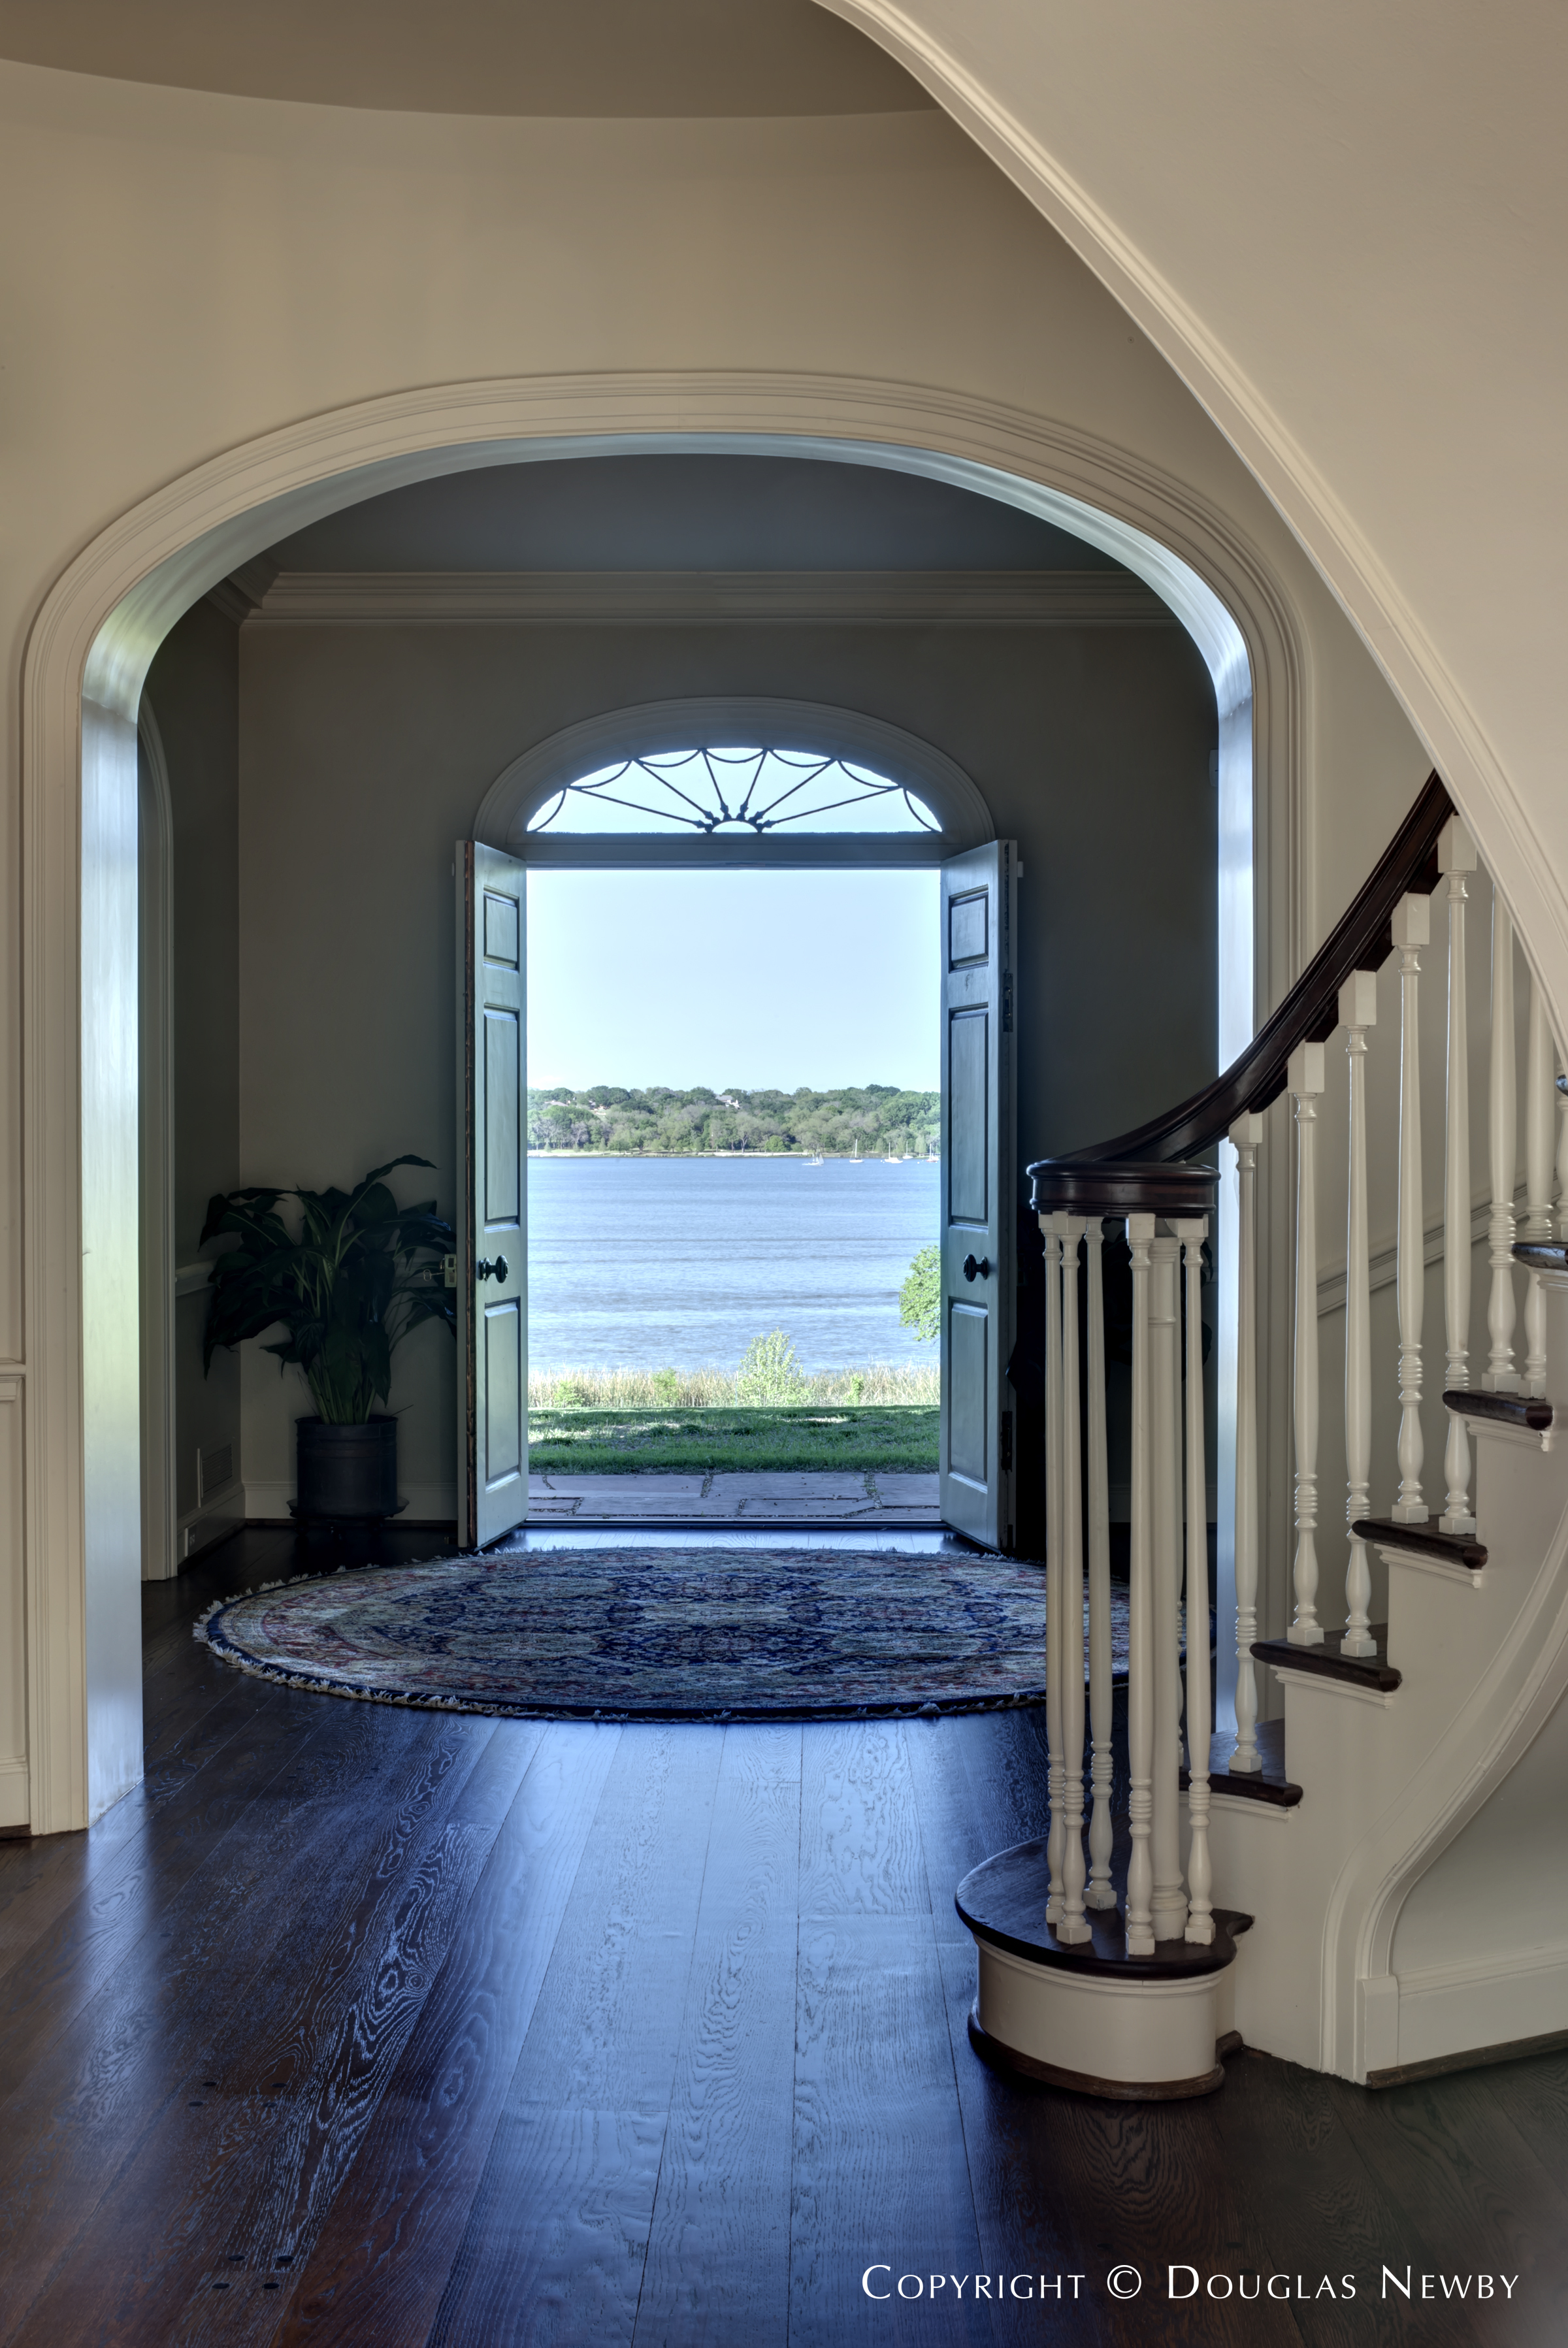 Architect Howard R. Meyer Designed Home in White Rock Lake